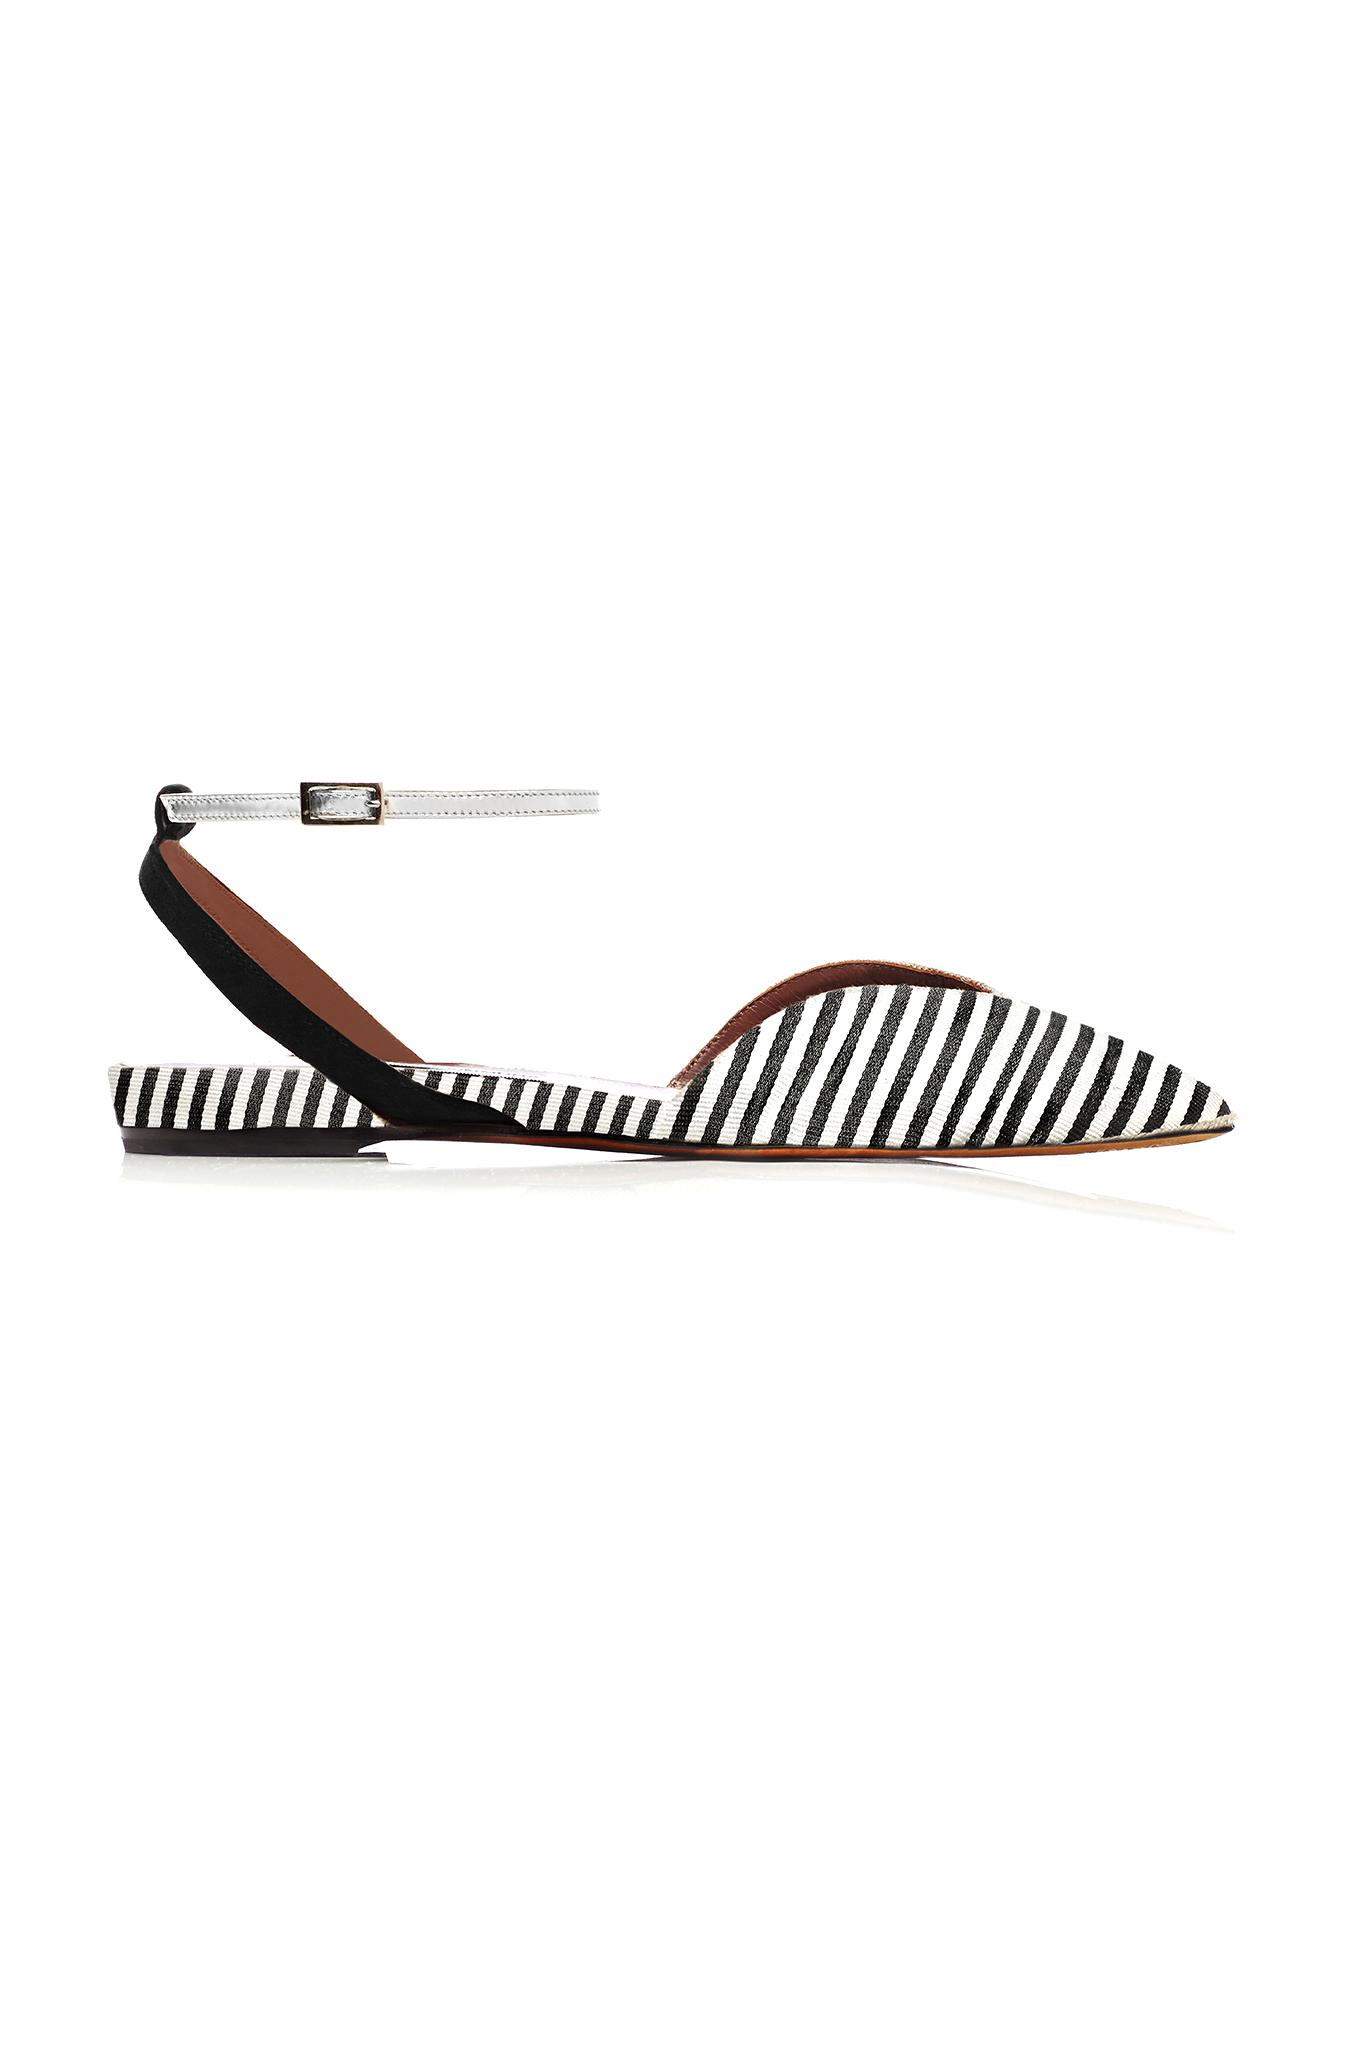 05-04-ankle-strap-flats.jpg